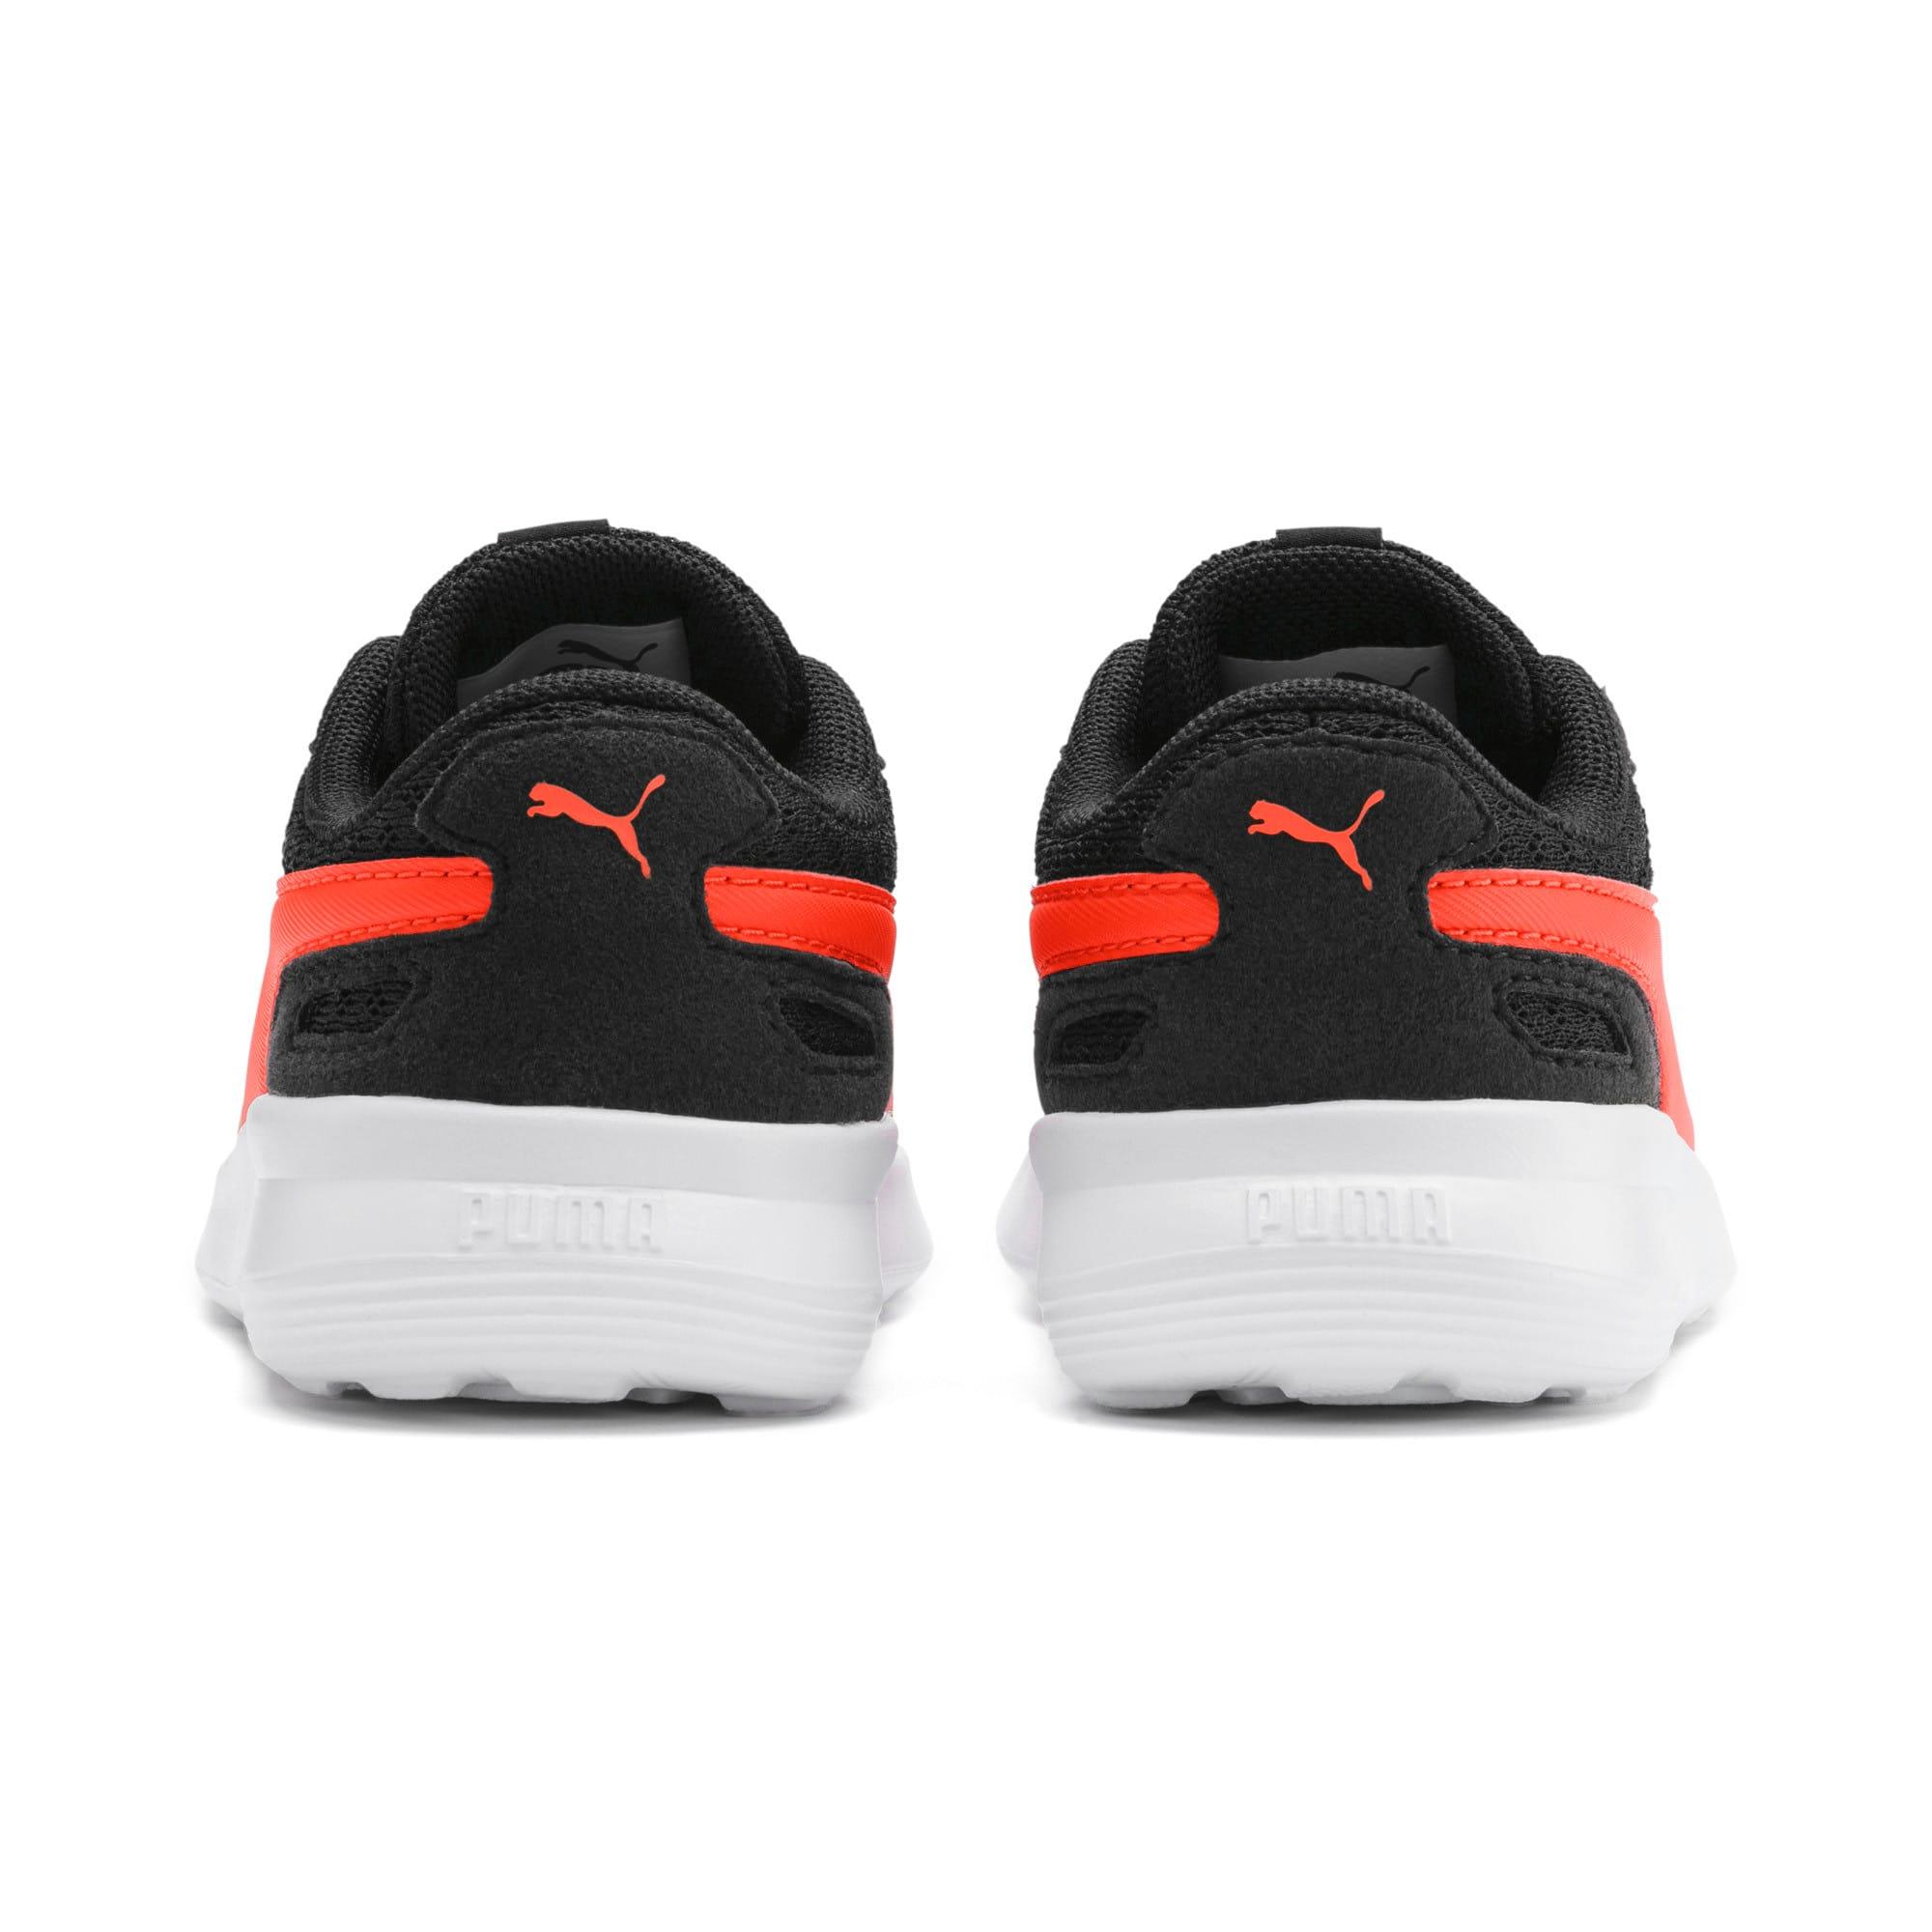 Thumbnail 3 of ST Activate AC Toddler Shoes, Puma Black-Cherry Tomato, medium